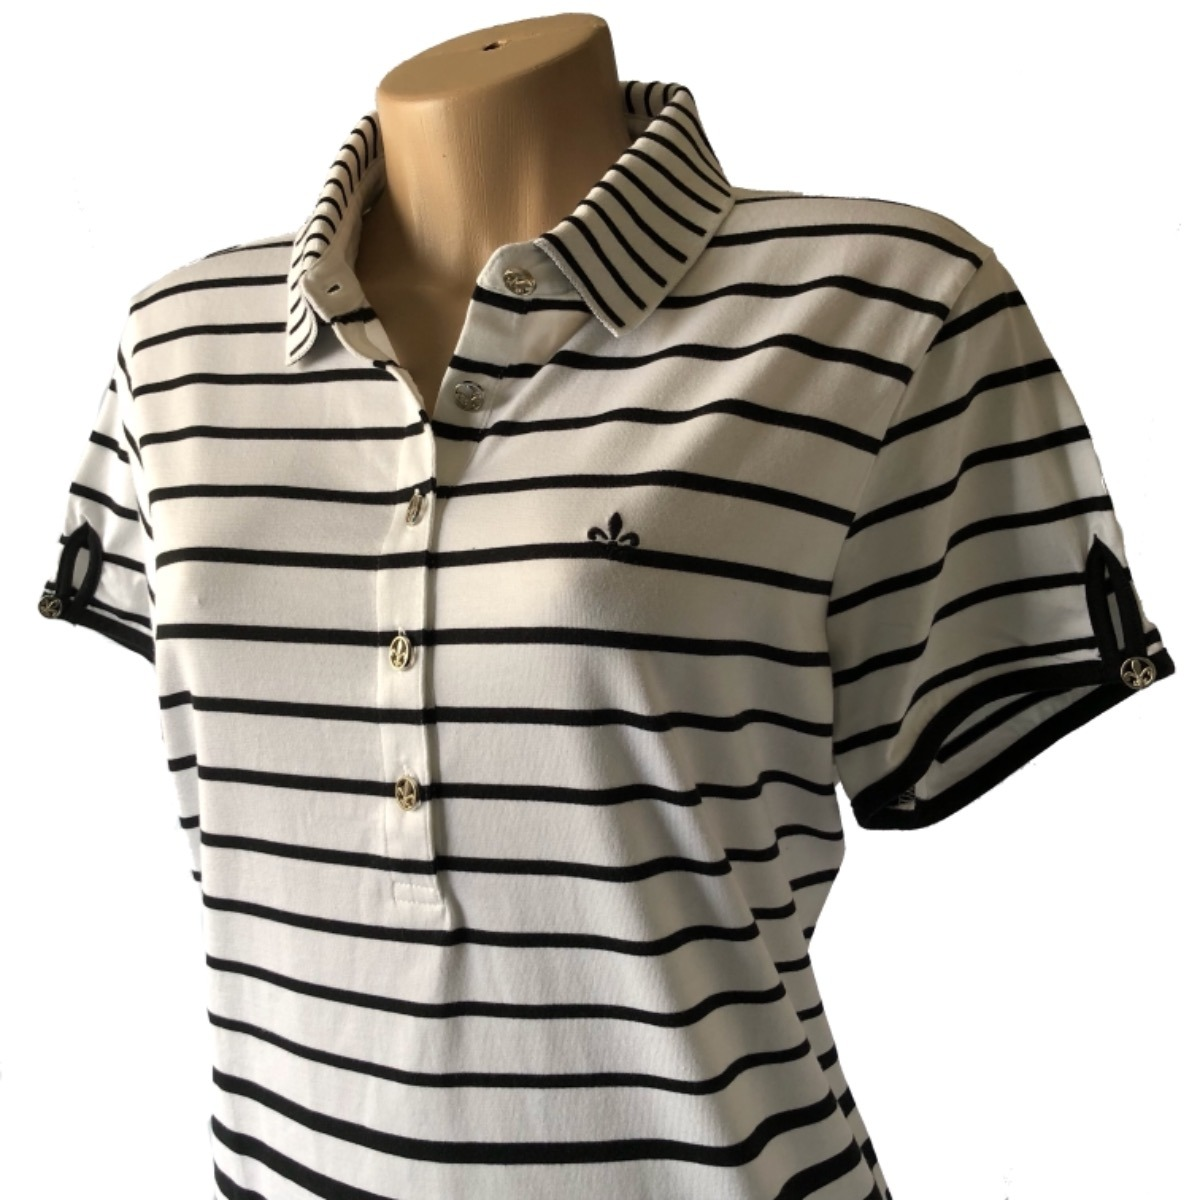 camisa polo dudalina original manga curta malha feminina. Carregando zoom. 748500ac3258f